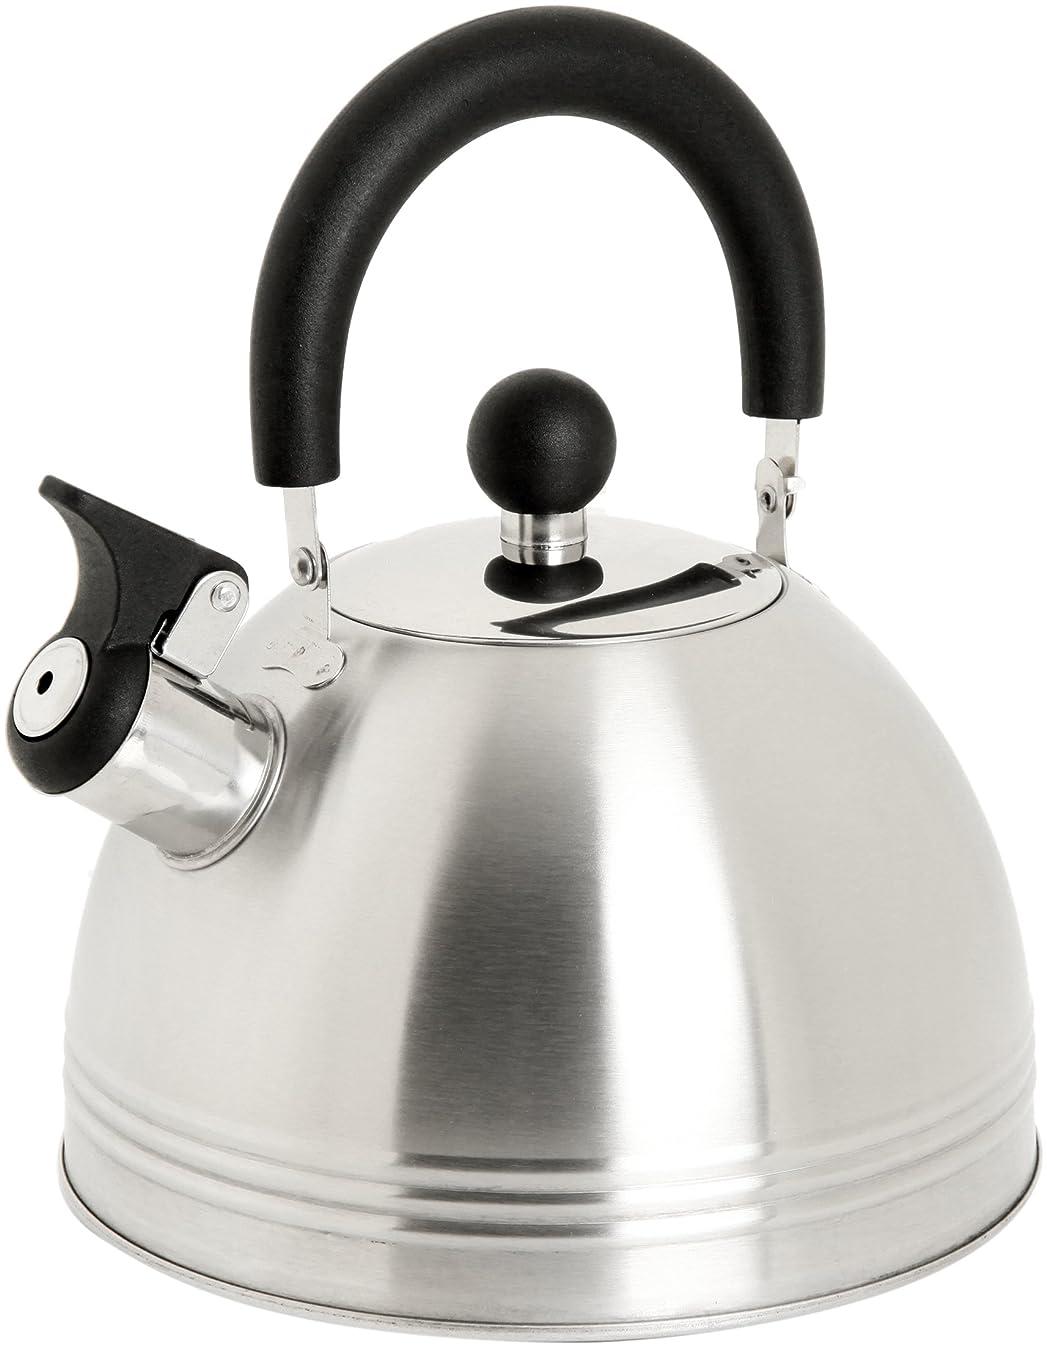 Mr. Coffee 91408.02 Carterton 1.5 Quart Stainless Steel Whistling Tea Kettle, Silver